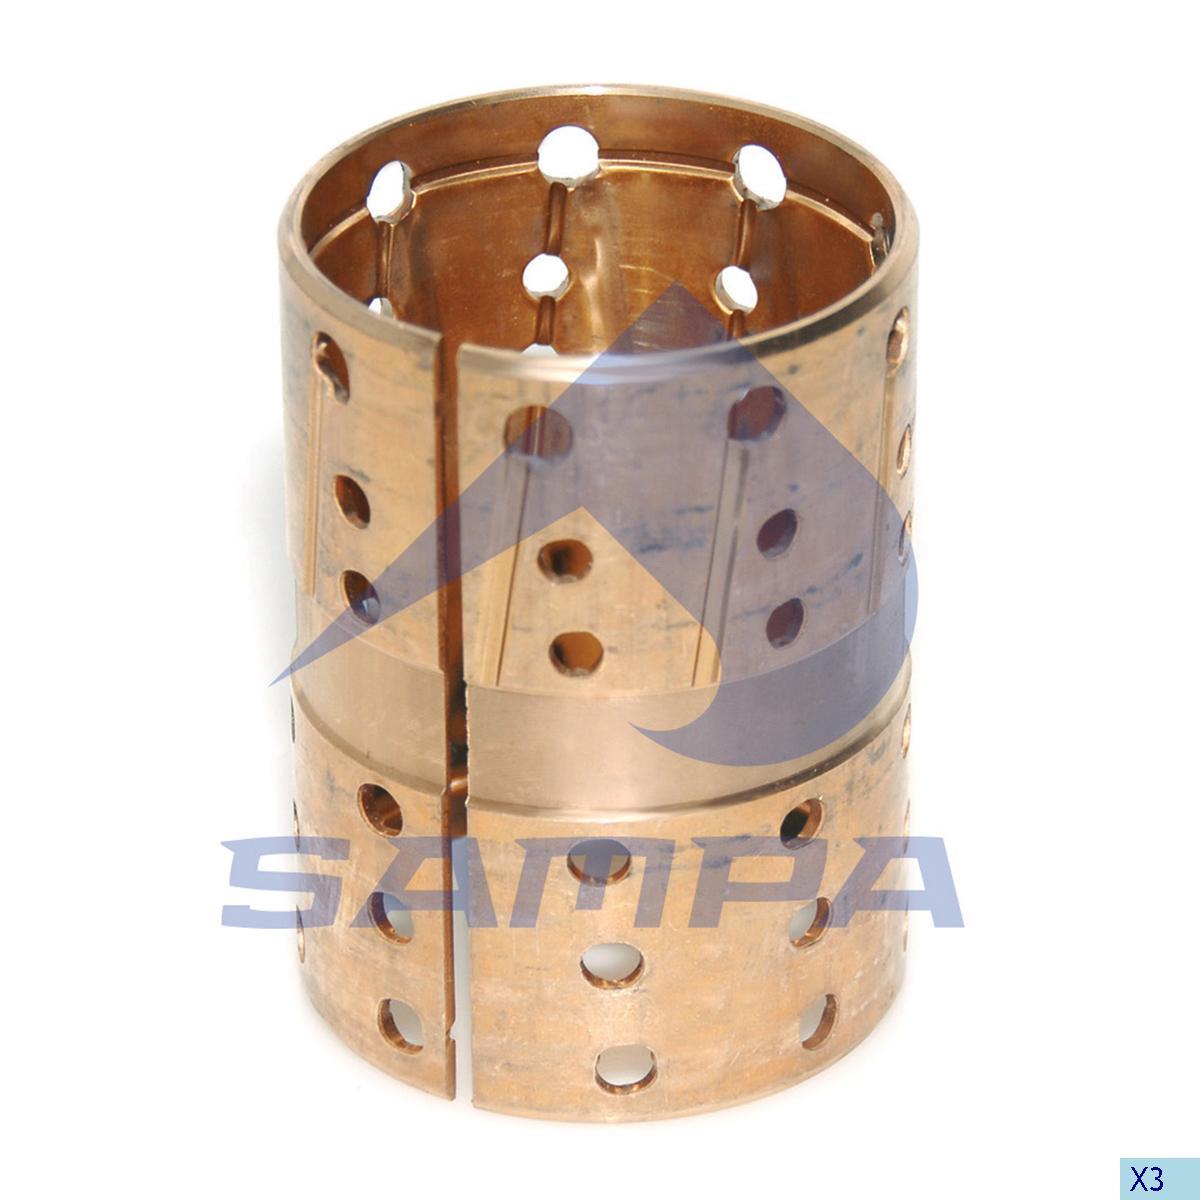 Bushing, Axle Steering Knuckle, Bergische Achsen, Power Unit